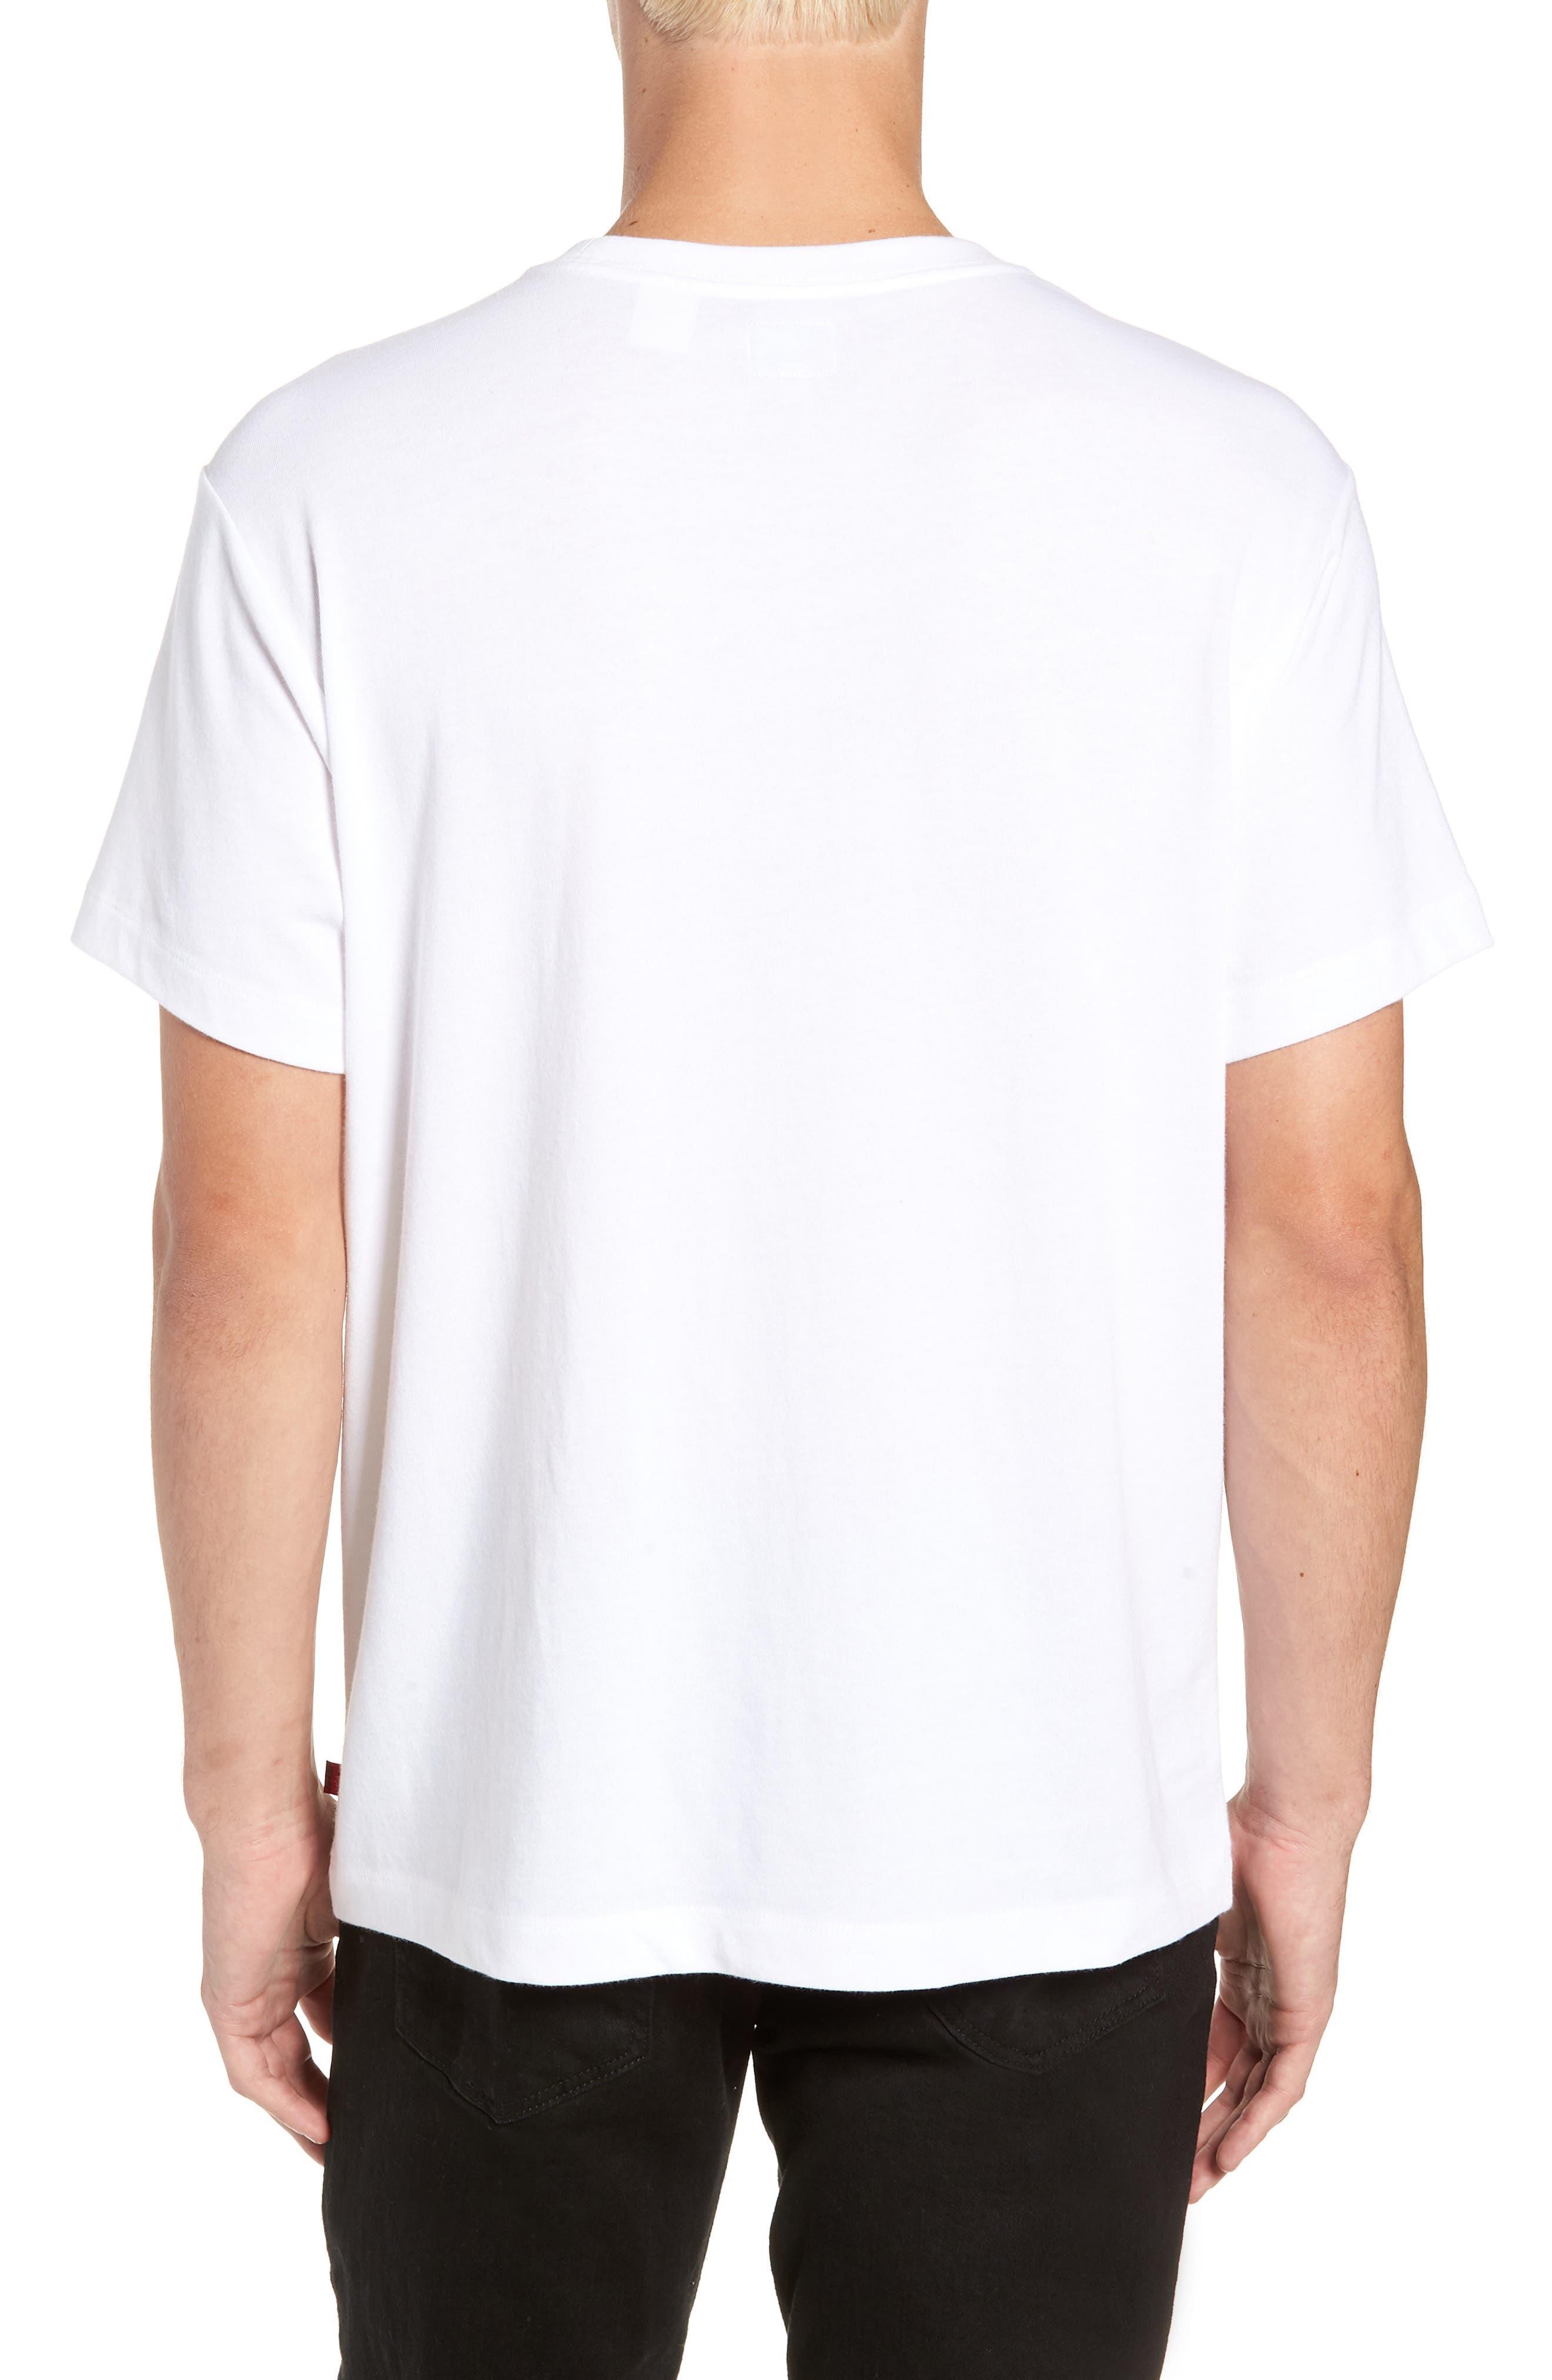 x Justin Timberlake Logo Graphic T-Shirt,                             Alternate thumbnail 2, color,                             FRESH LEAVES WHITE